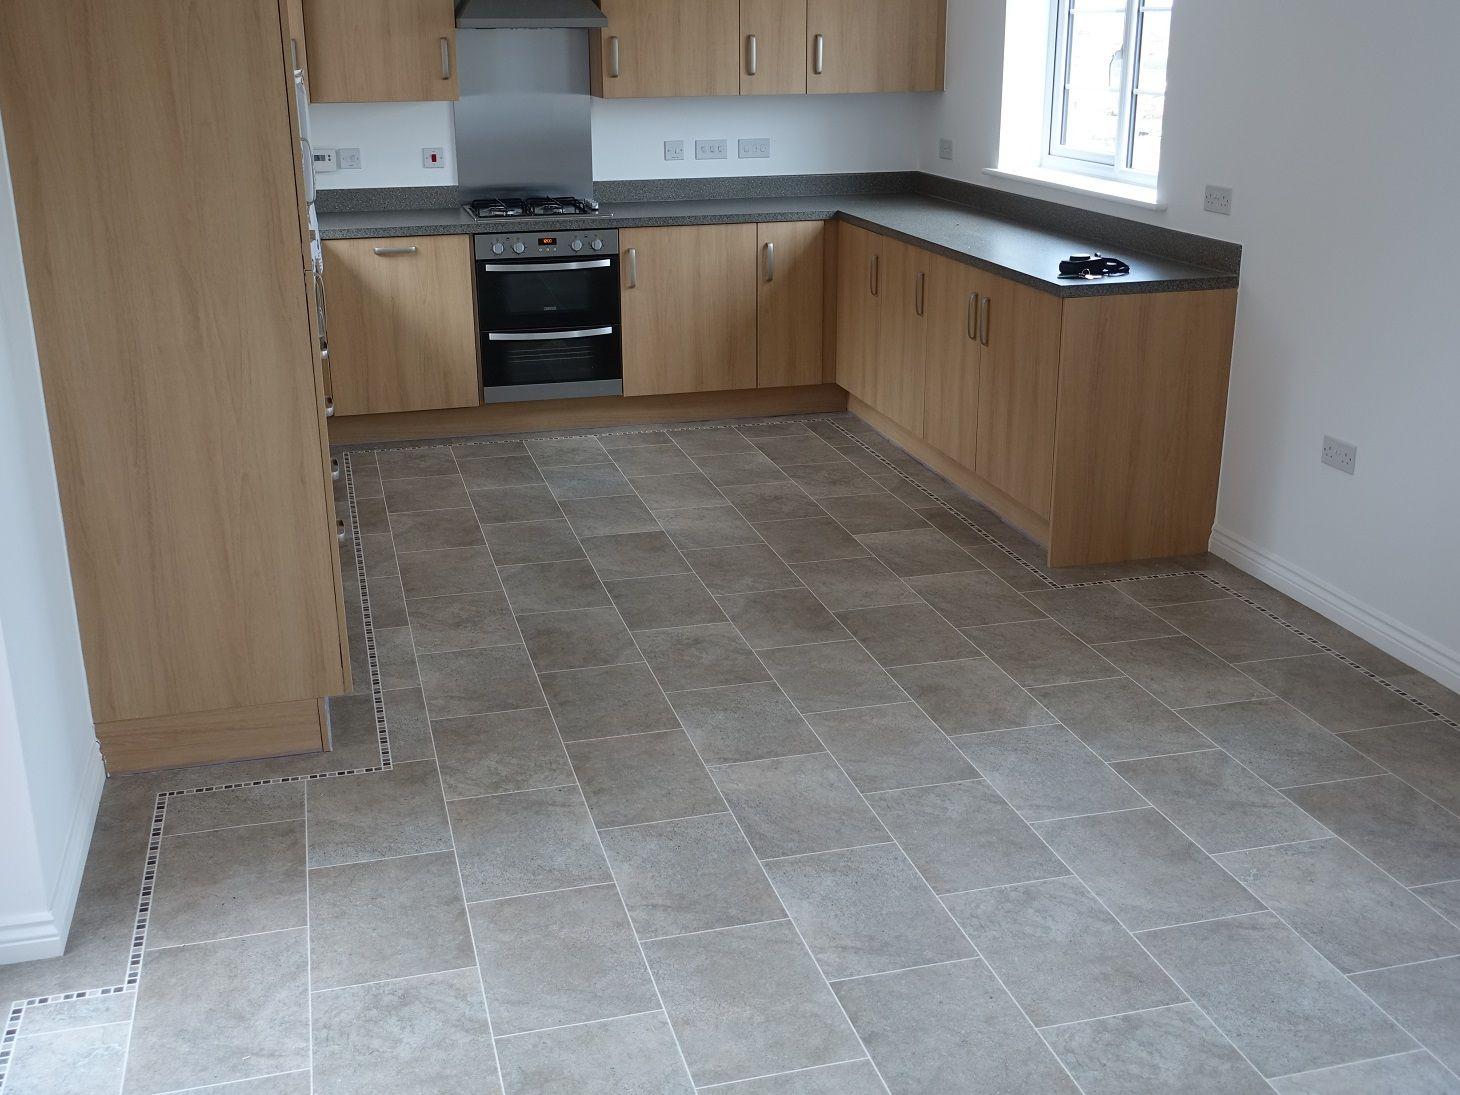 Billig Küche Bodenbelag